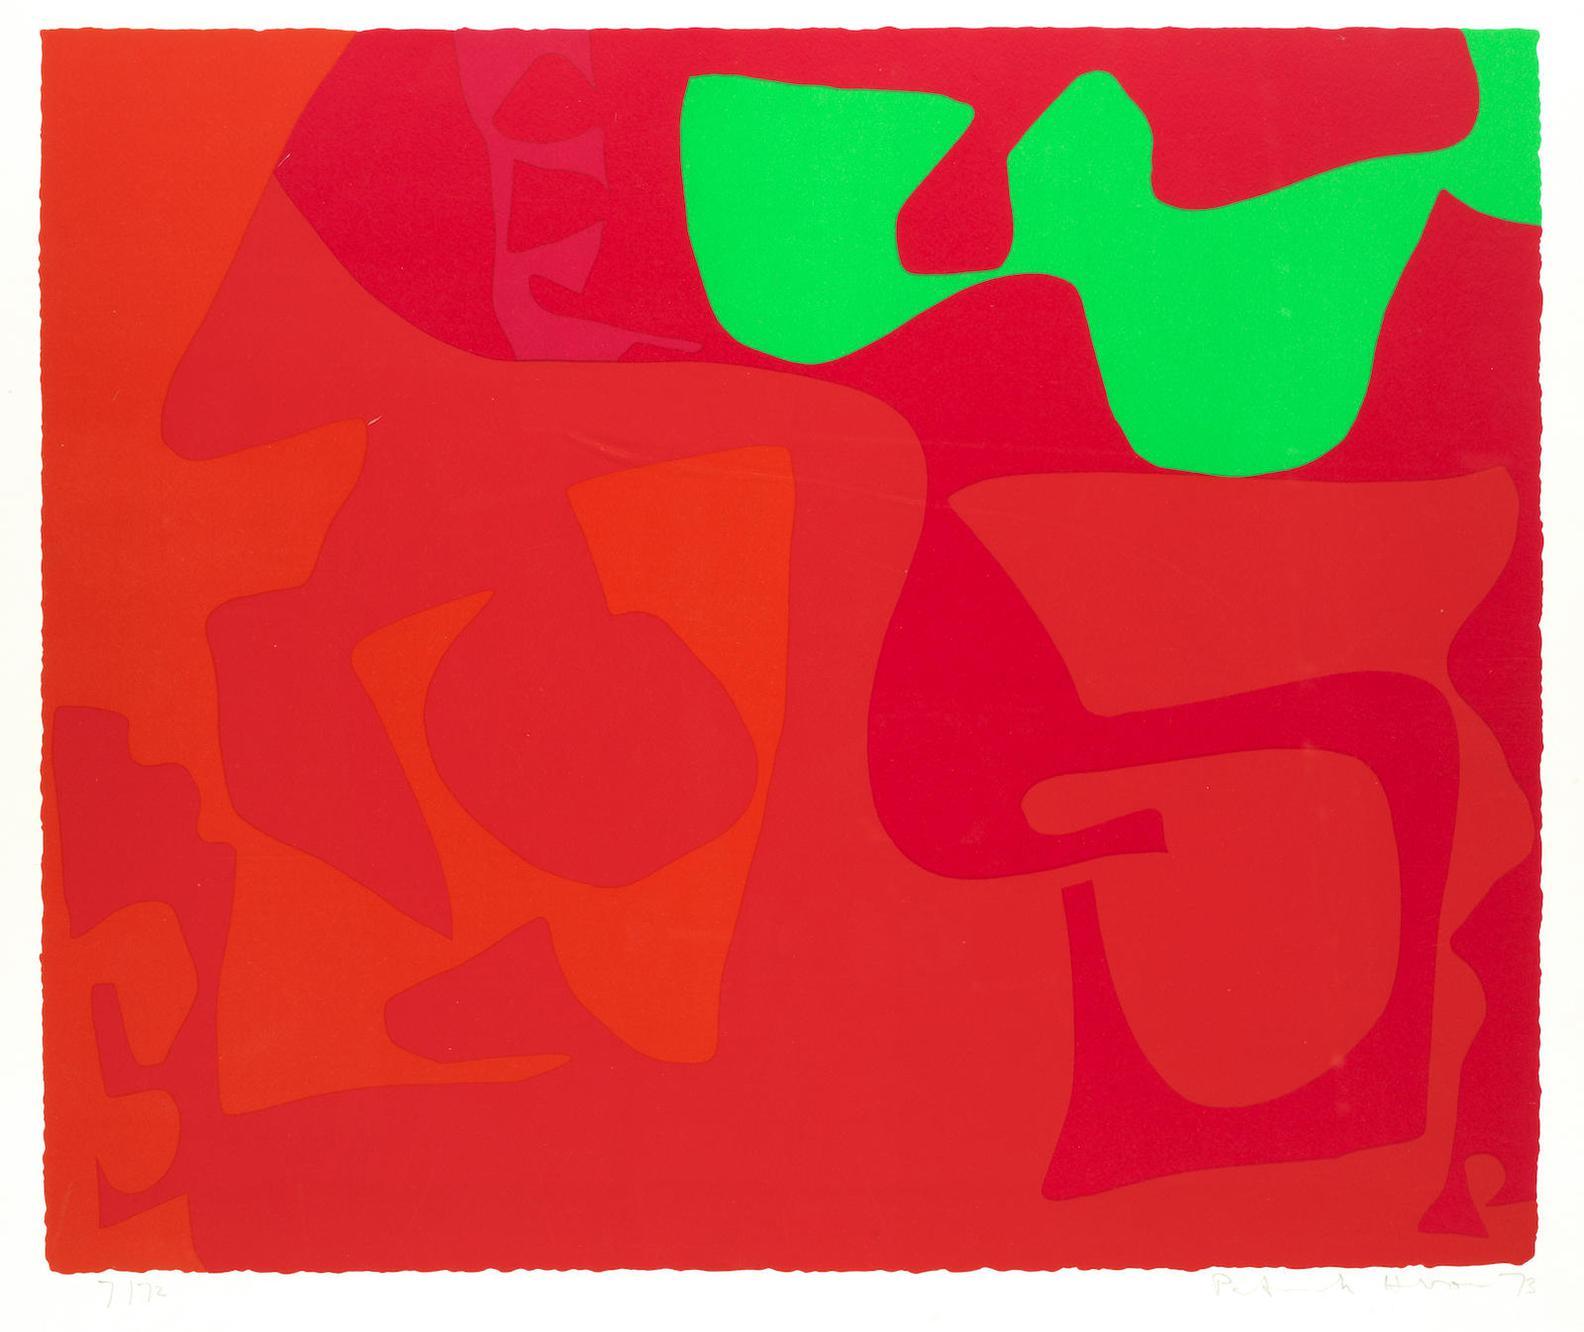 Patrick Heron-Small Red: January 1973 : 2-1973